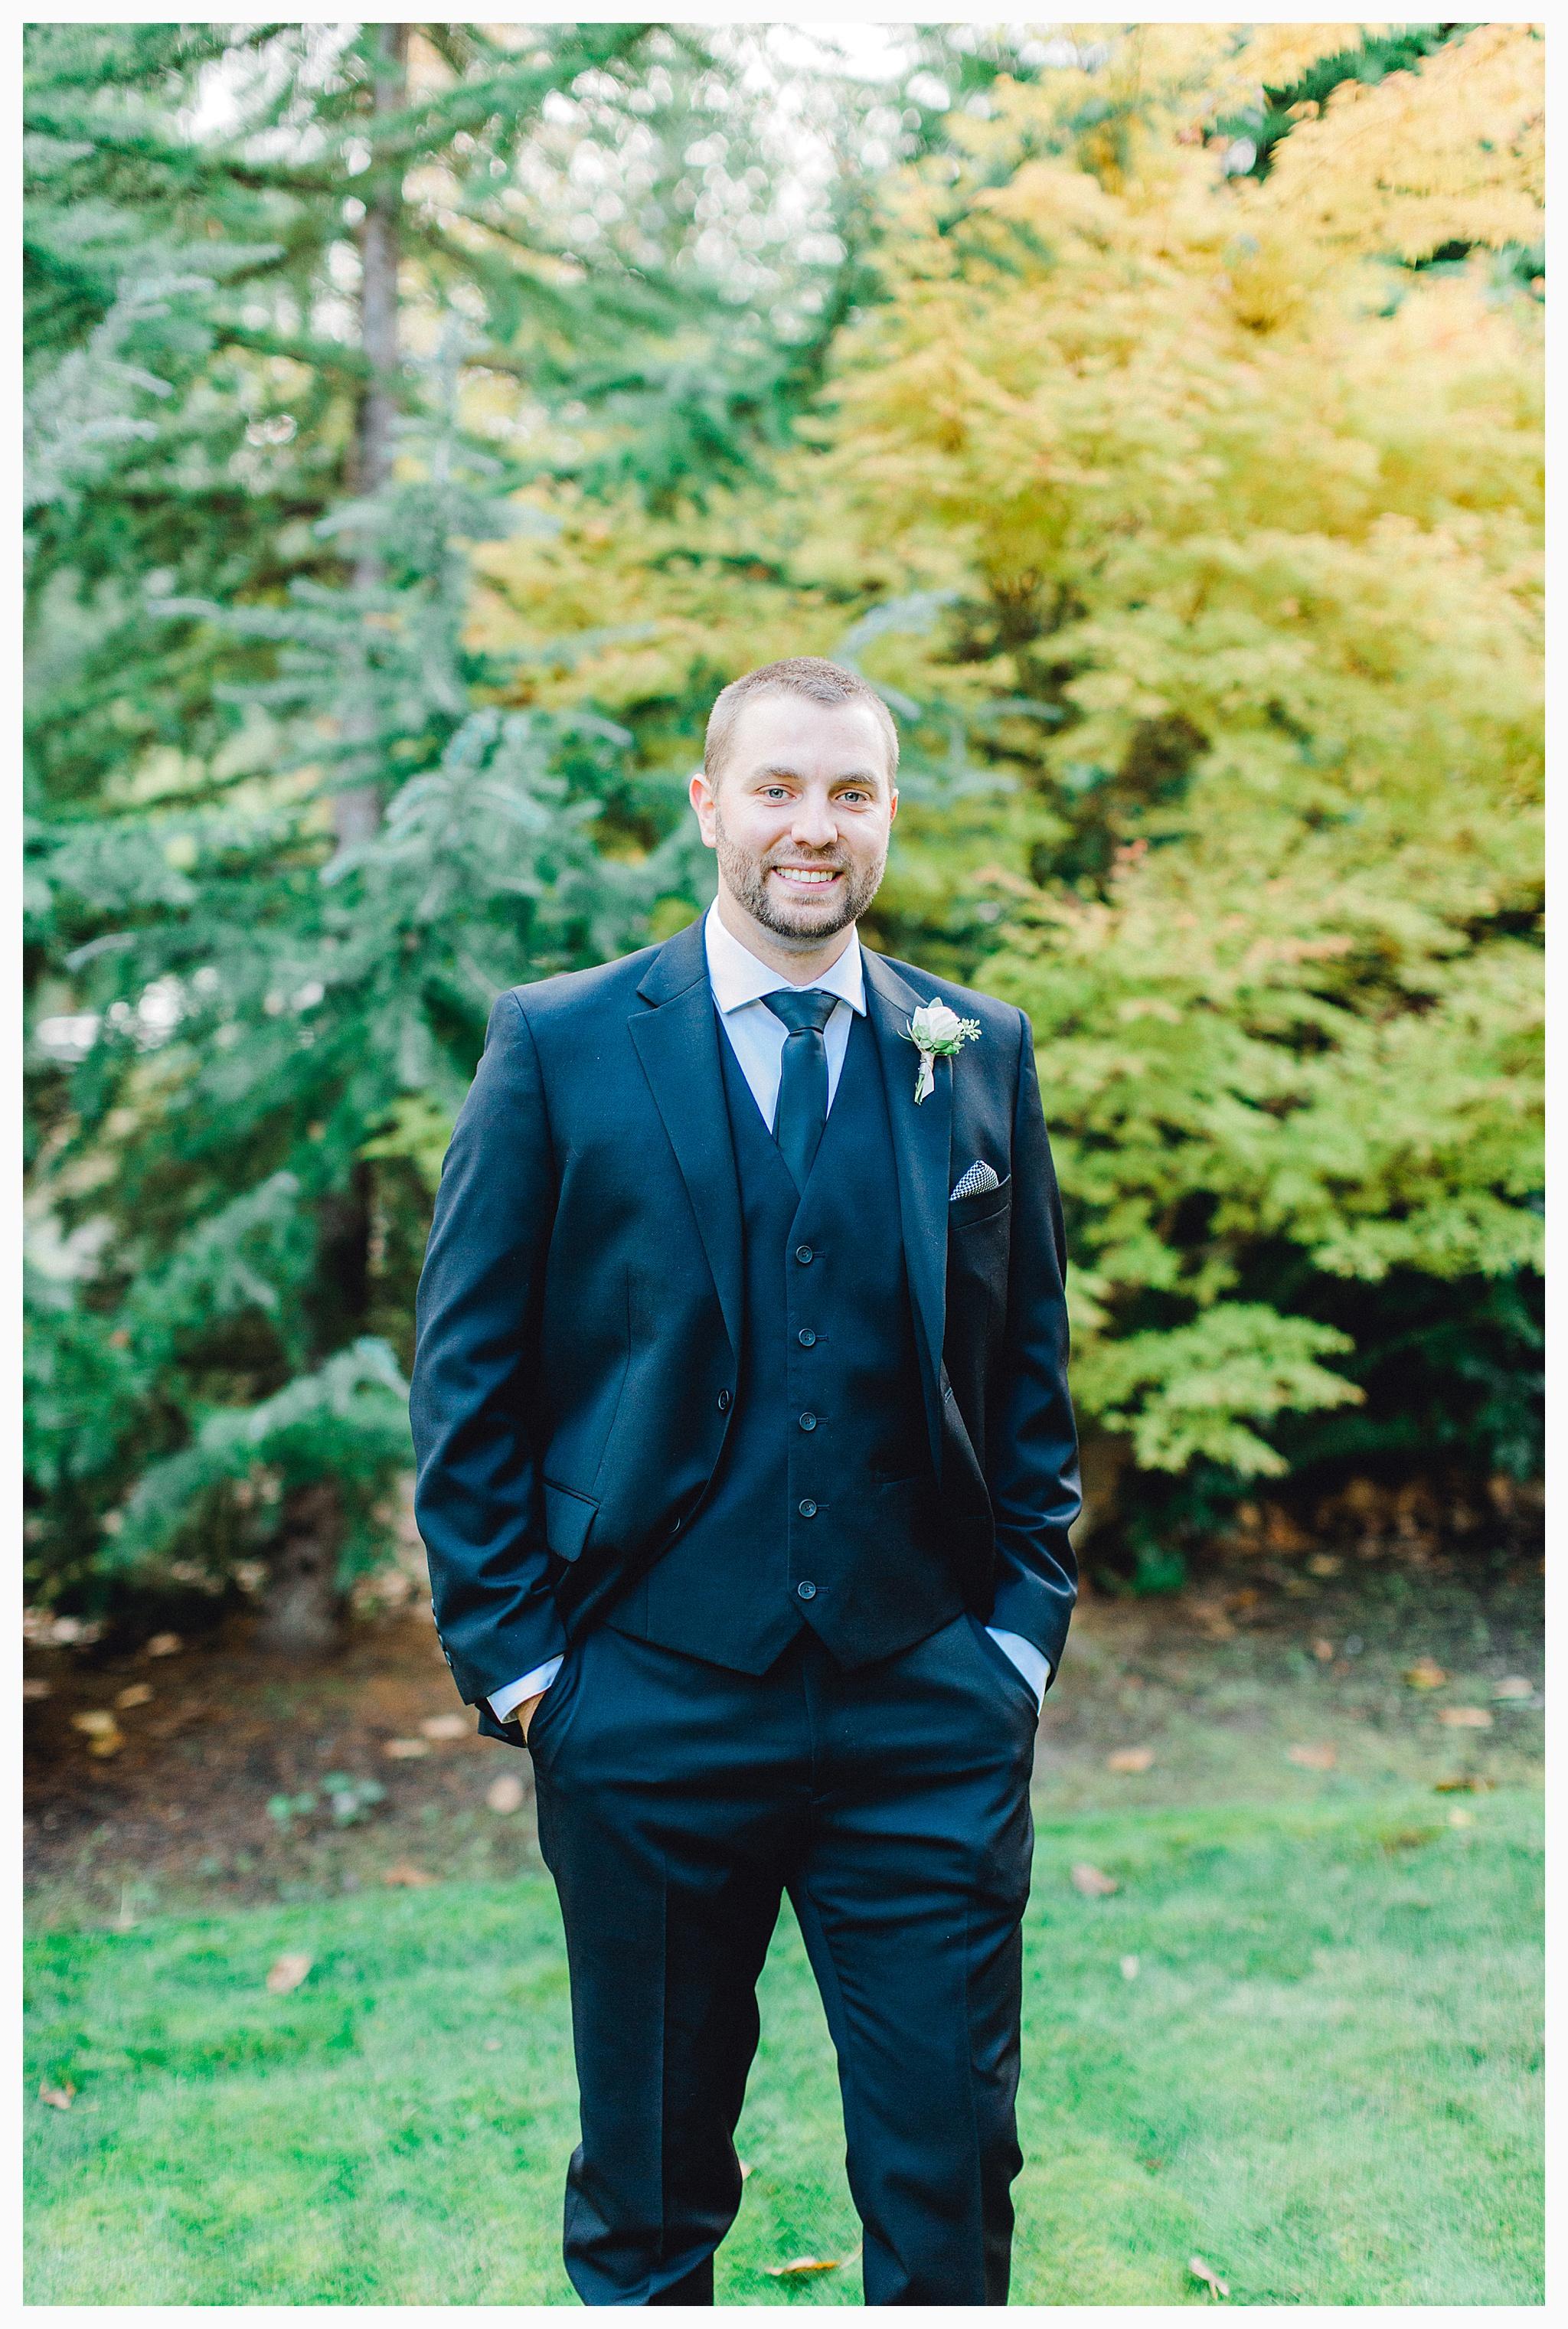 Emma Rose Company Light and Airy Wedding Photographer, Beautiful fall wedding at Rock Creek Gardens Venue in Puyallup, Washington._0040.jpg